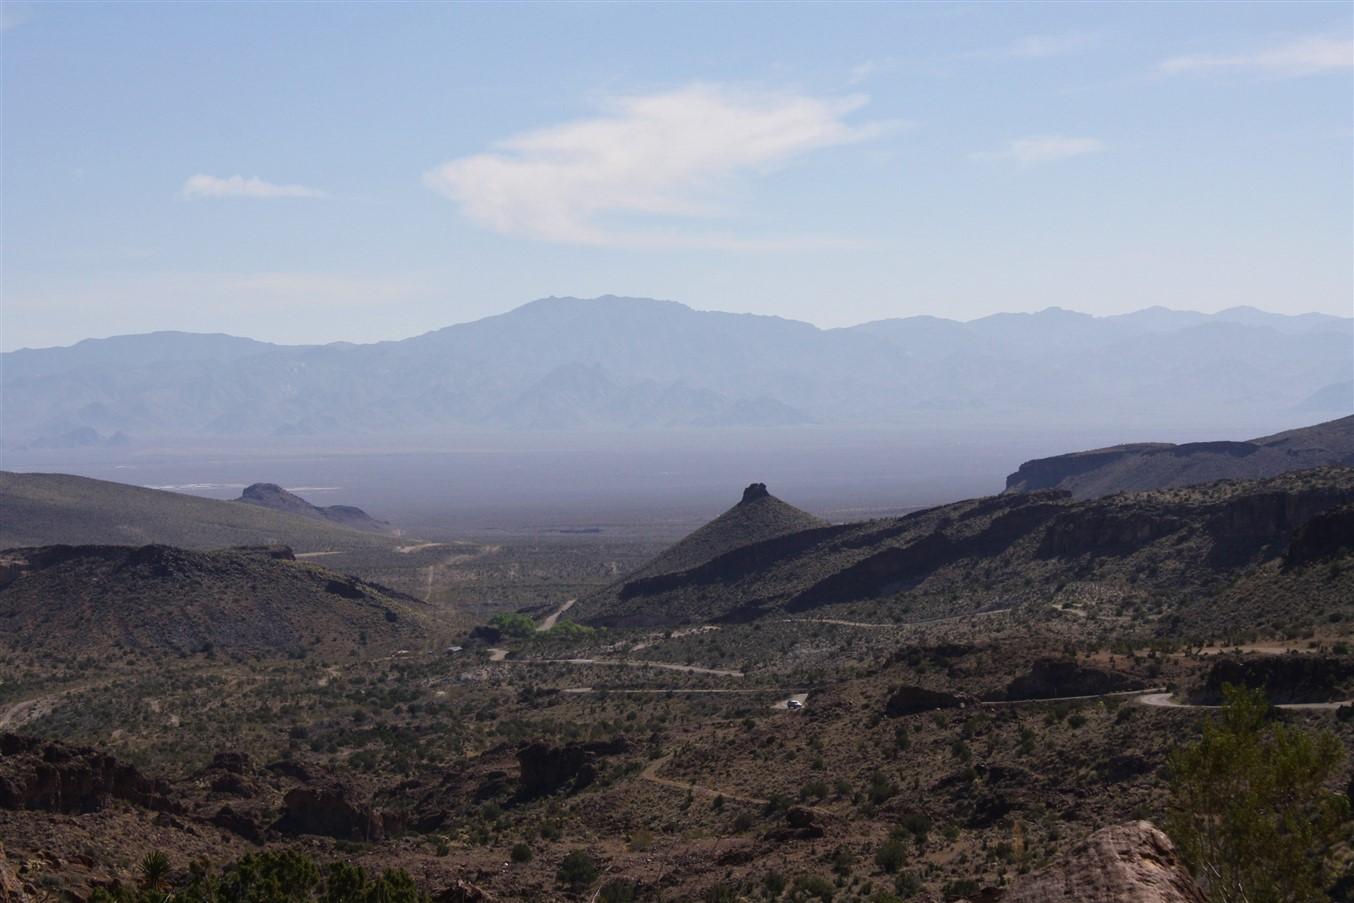 2012 03 14 Route 66 Road Trip 116 Oatman Highway Arizona.jpg